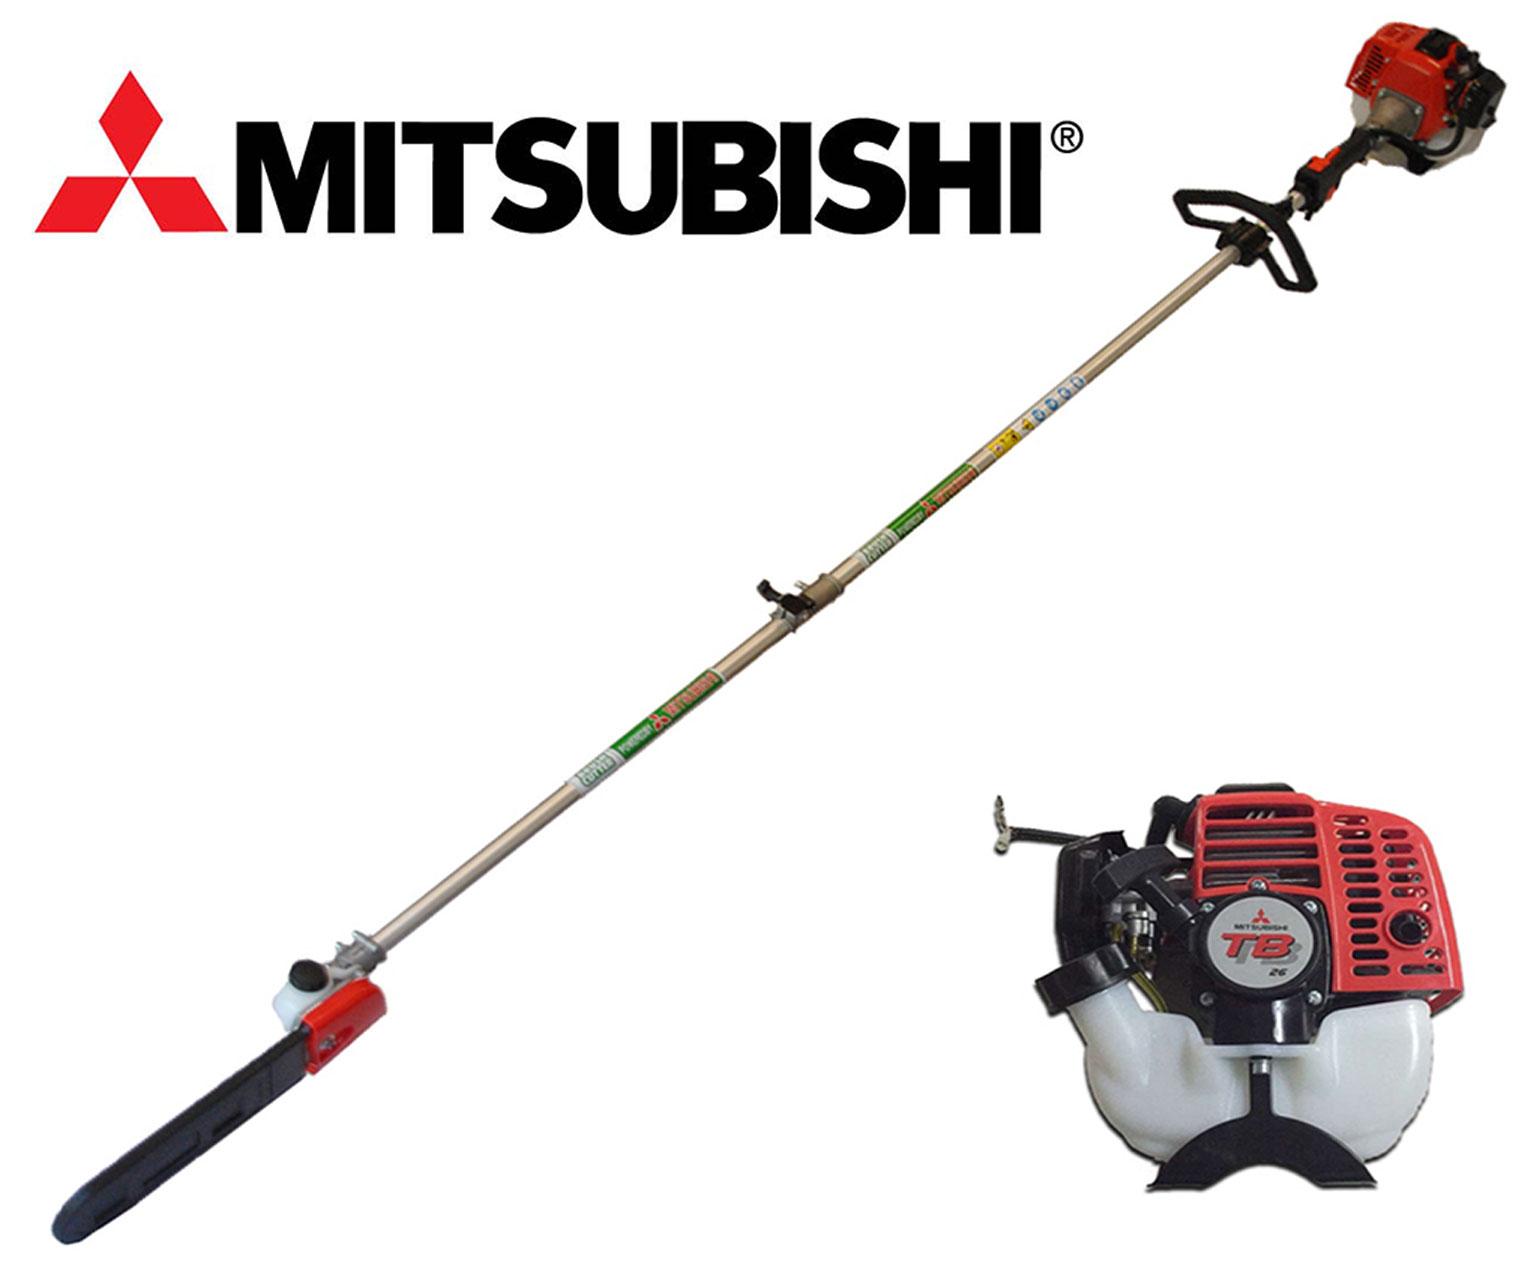 POWER PRUNER MITSUBISHI PTB 260 POWER PRUNERS